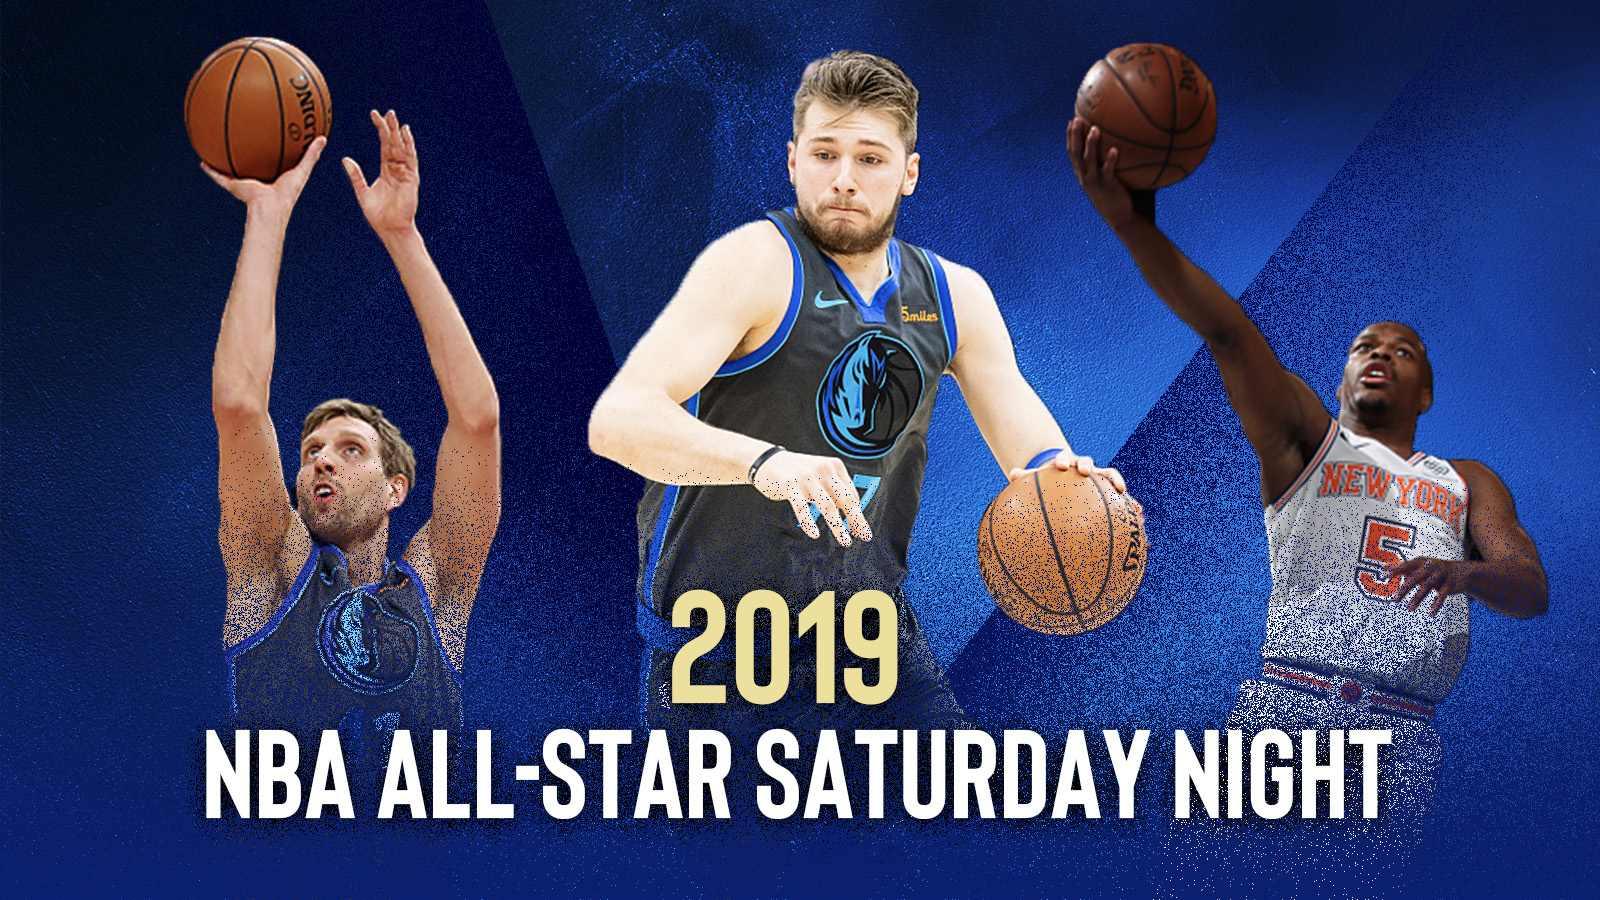 Sports Wallpapers Nba All Star 2019 Wallpaper Hd